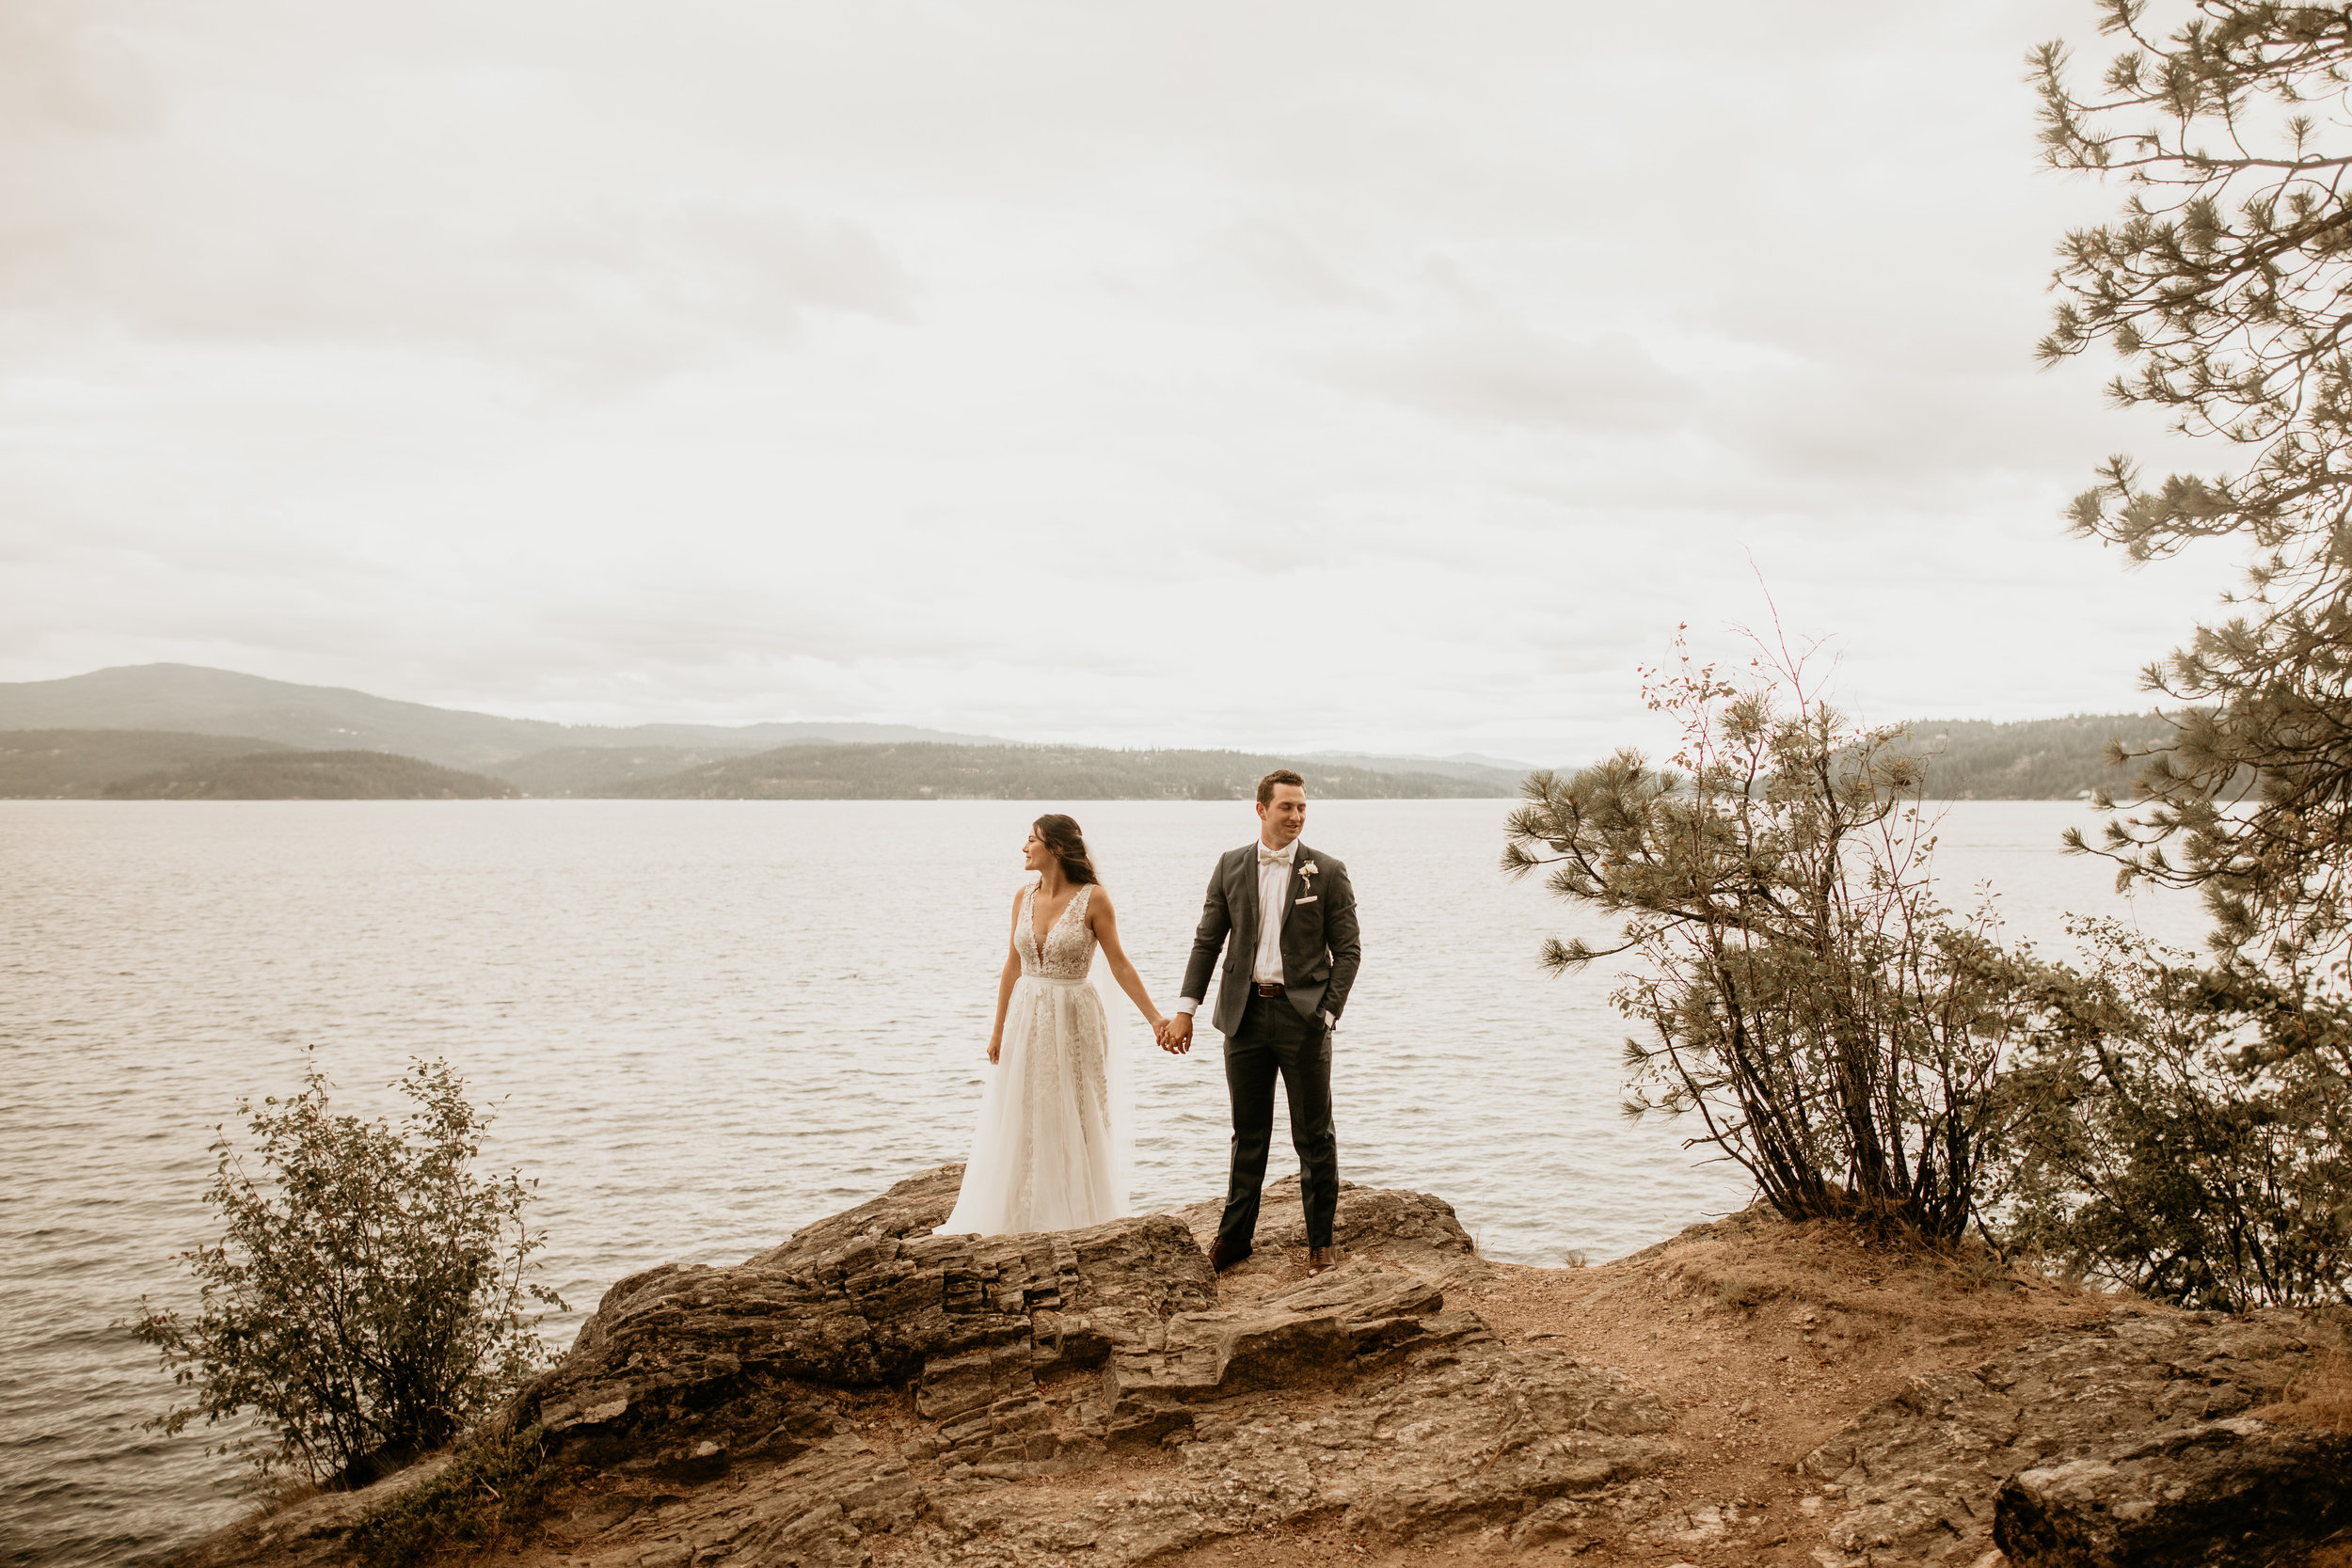 coeur-d'alene-wedding-photography-bride-and-groom-94.jpg